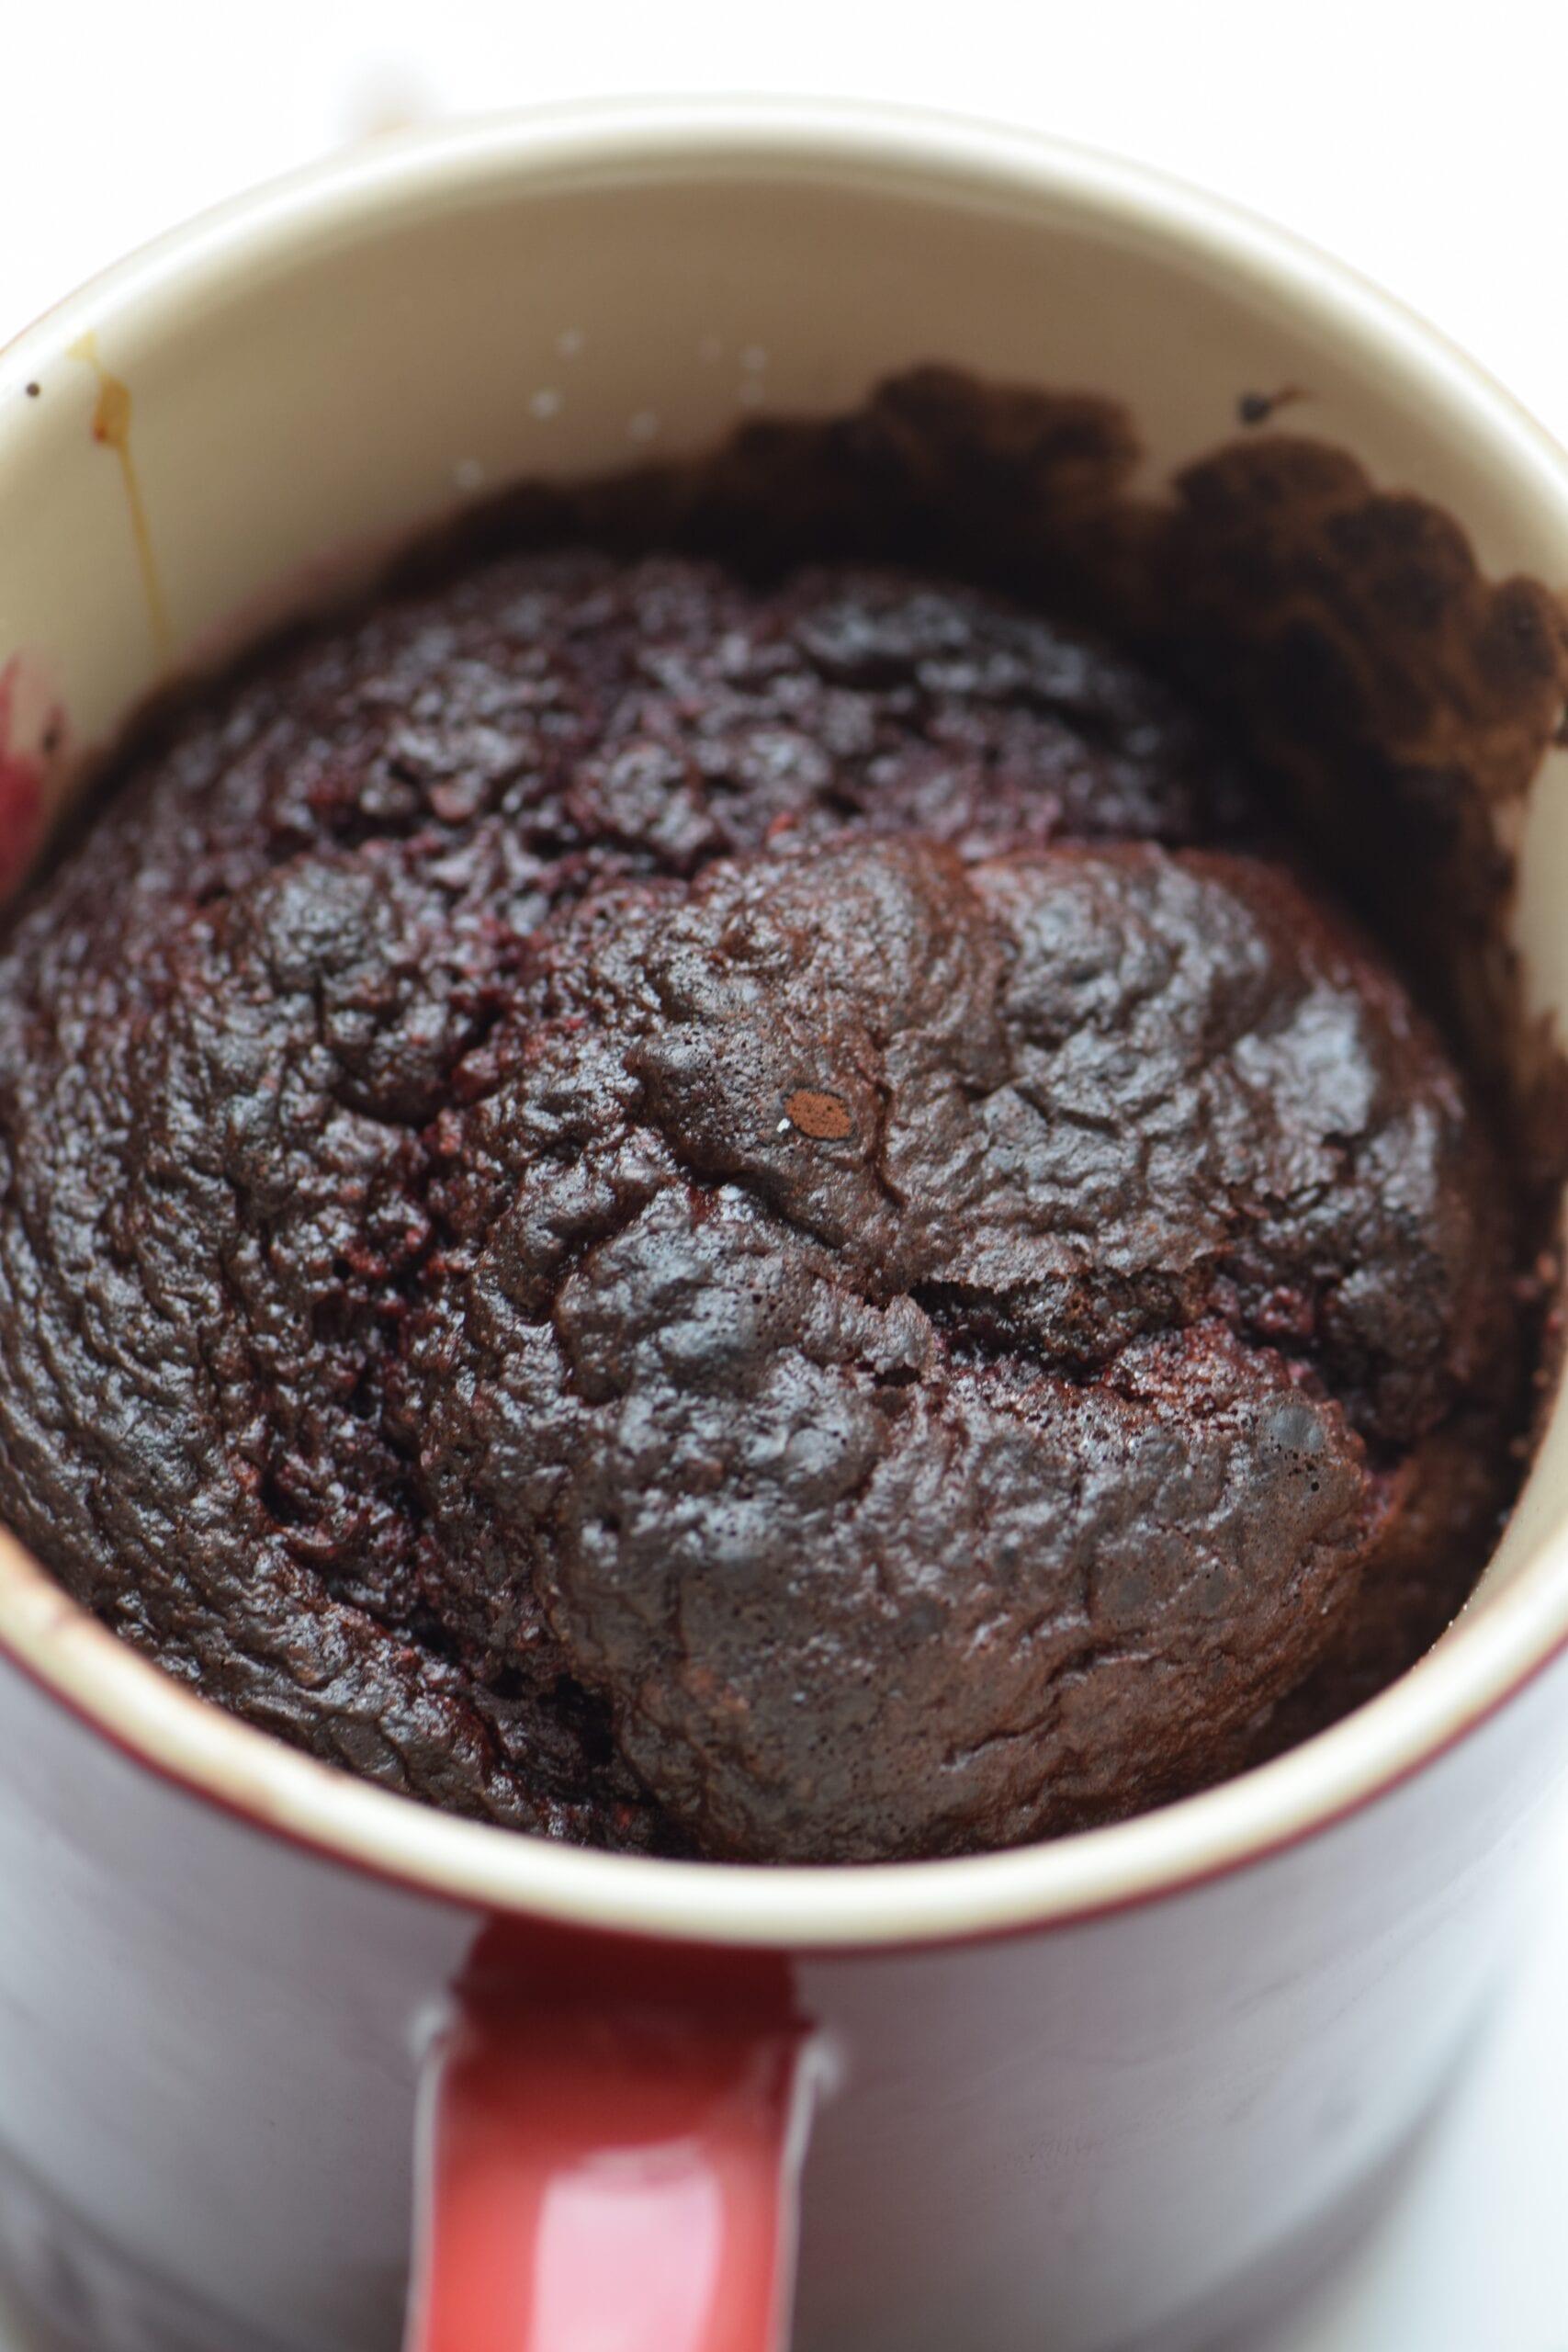 Healthy red velvet cupcake mugcake with no topping